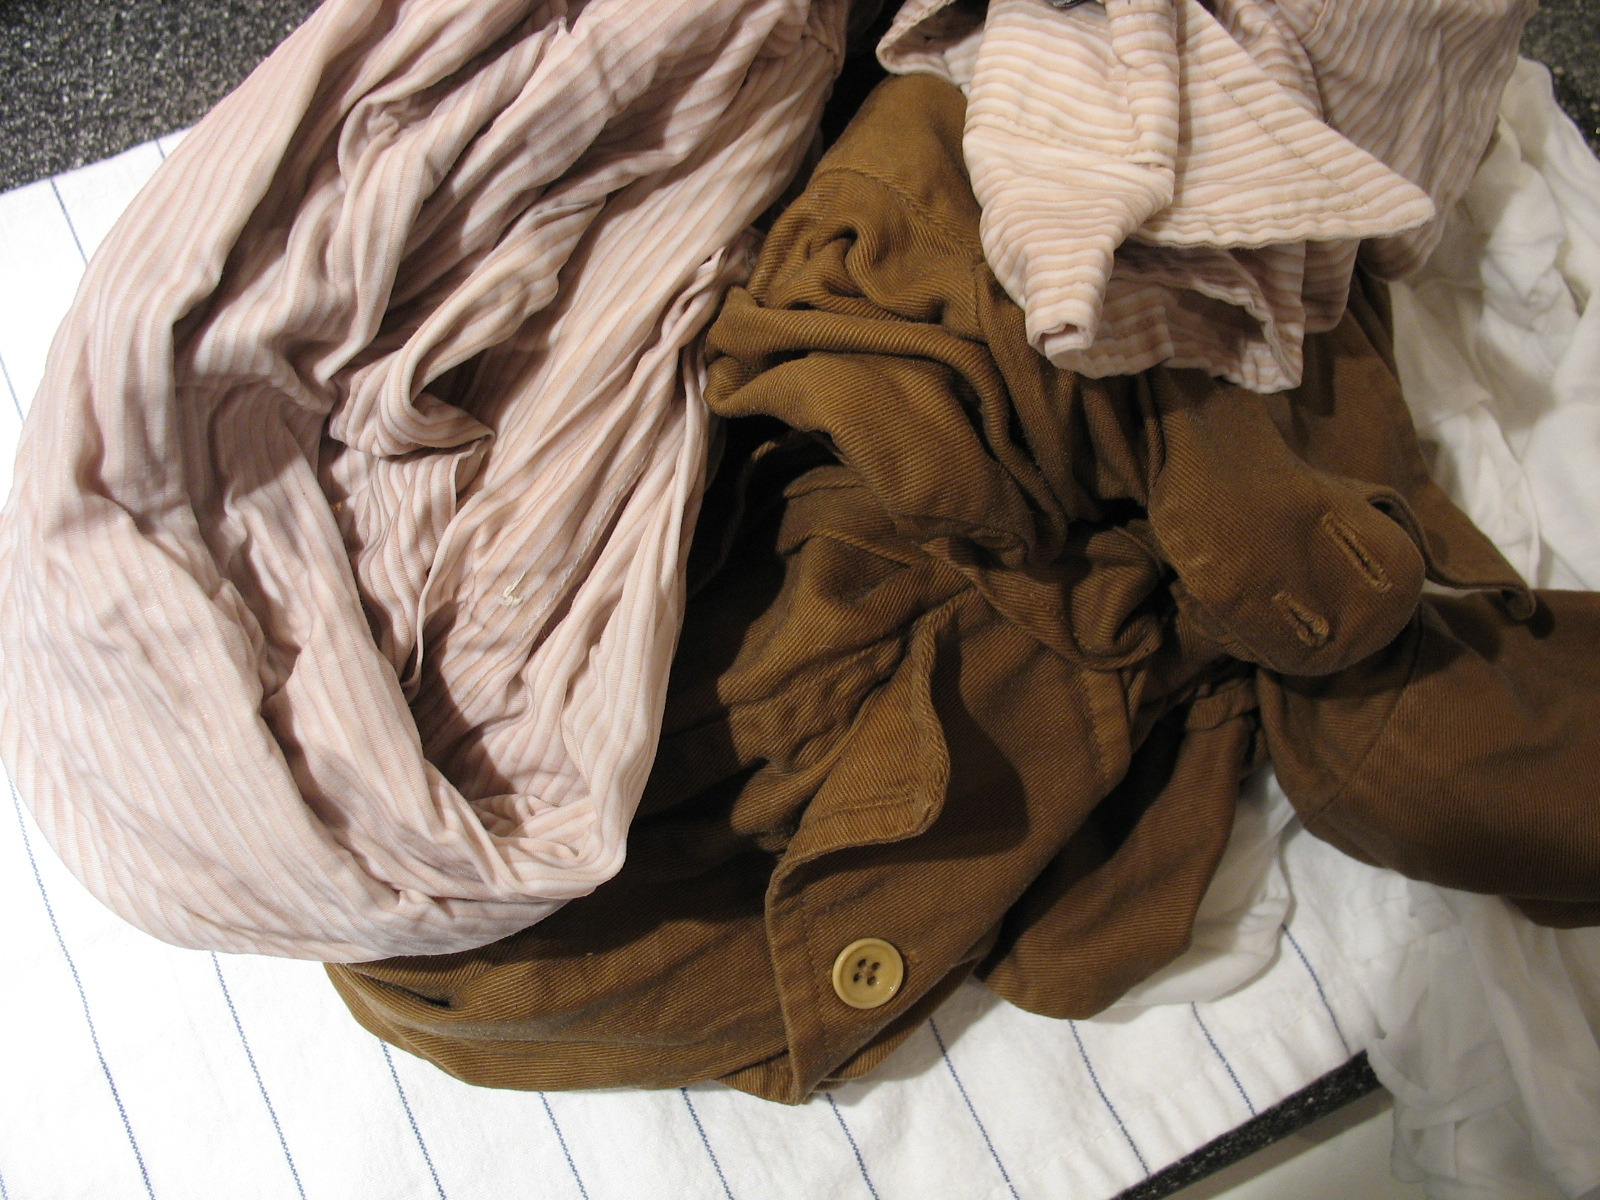 Shirts-Wet.JPG